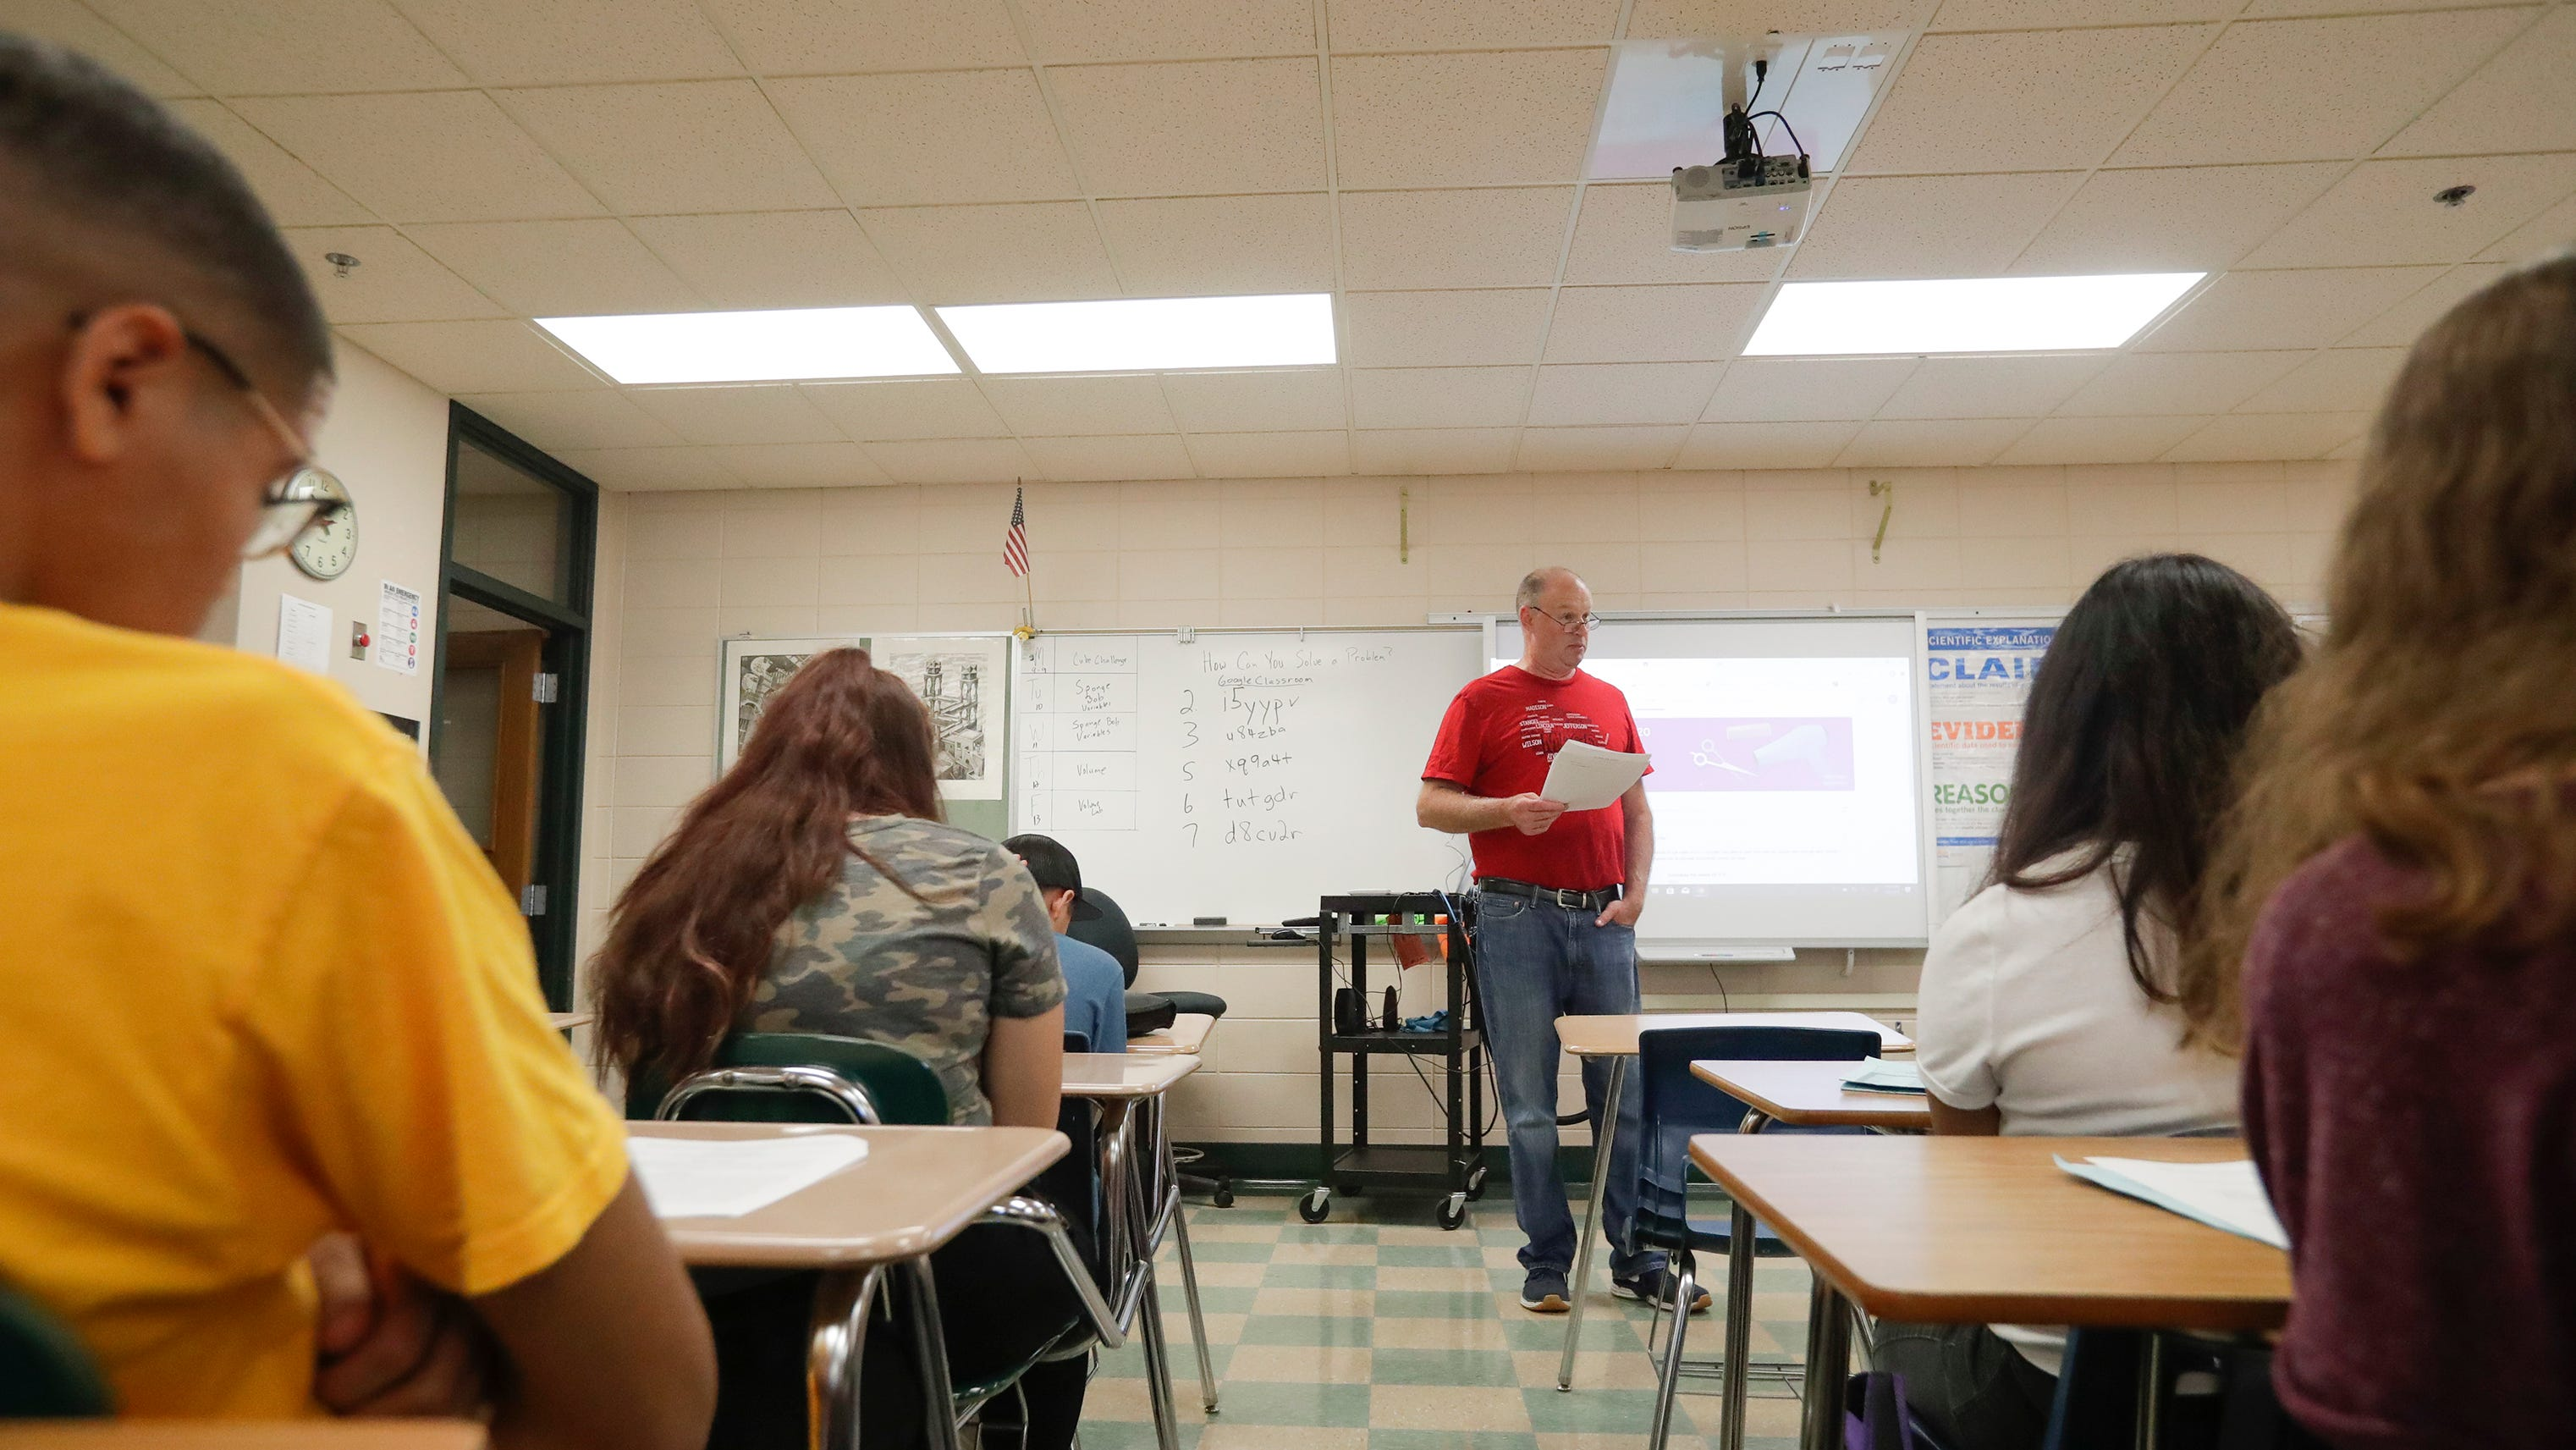 Manitowoc schools not teaching critical race theory, Mark Holzman says